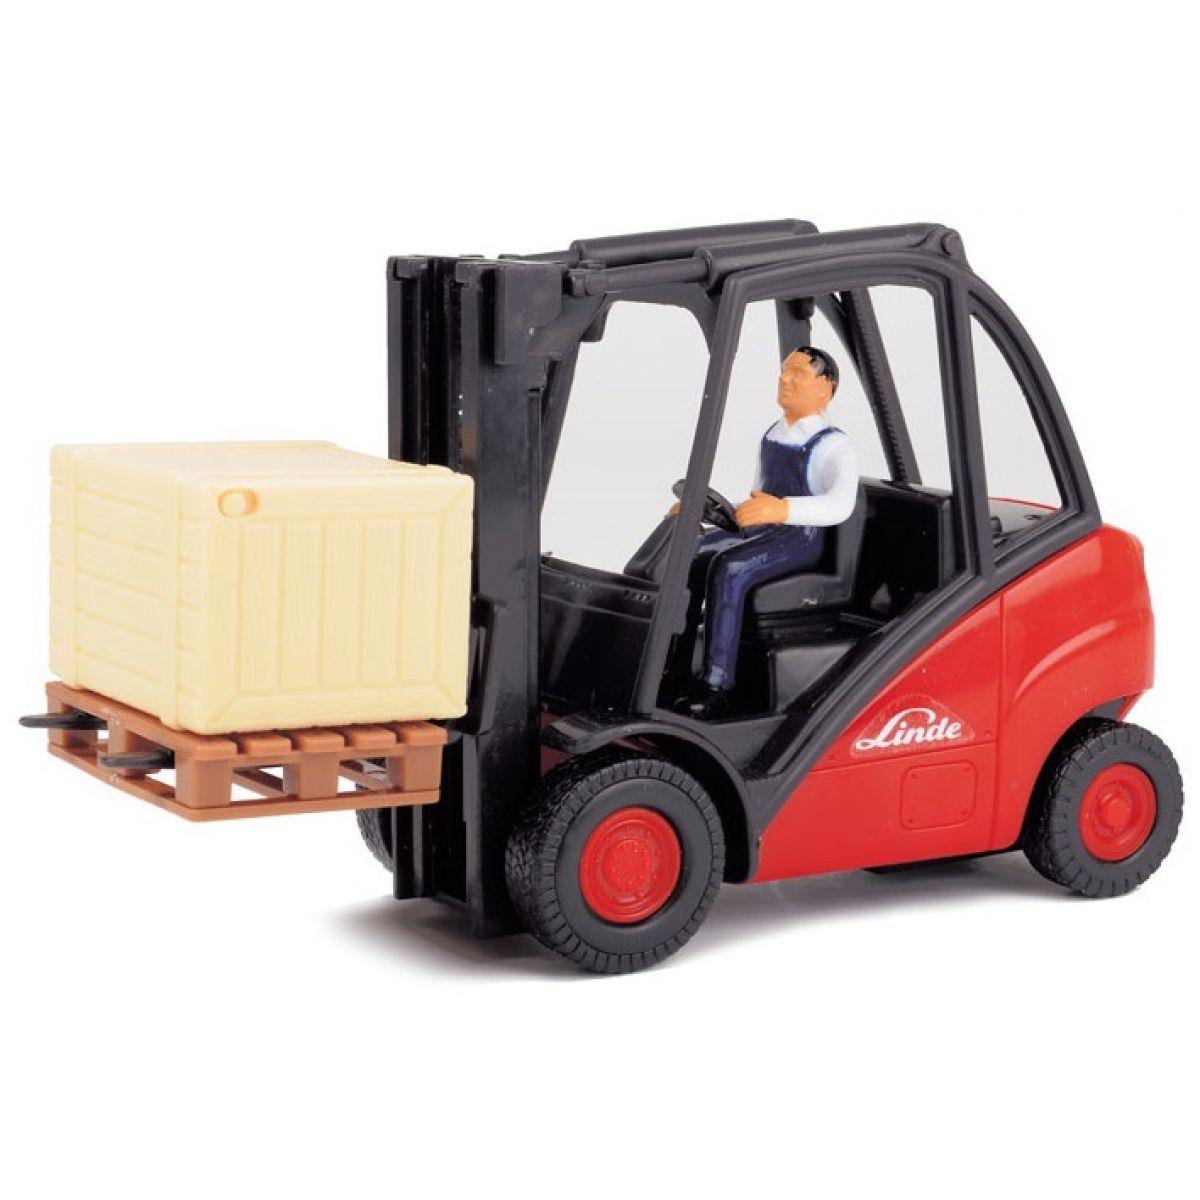 Dickie Ještěrka Cargo Lifter